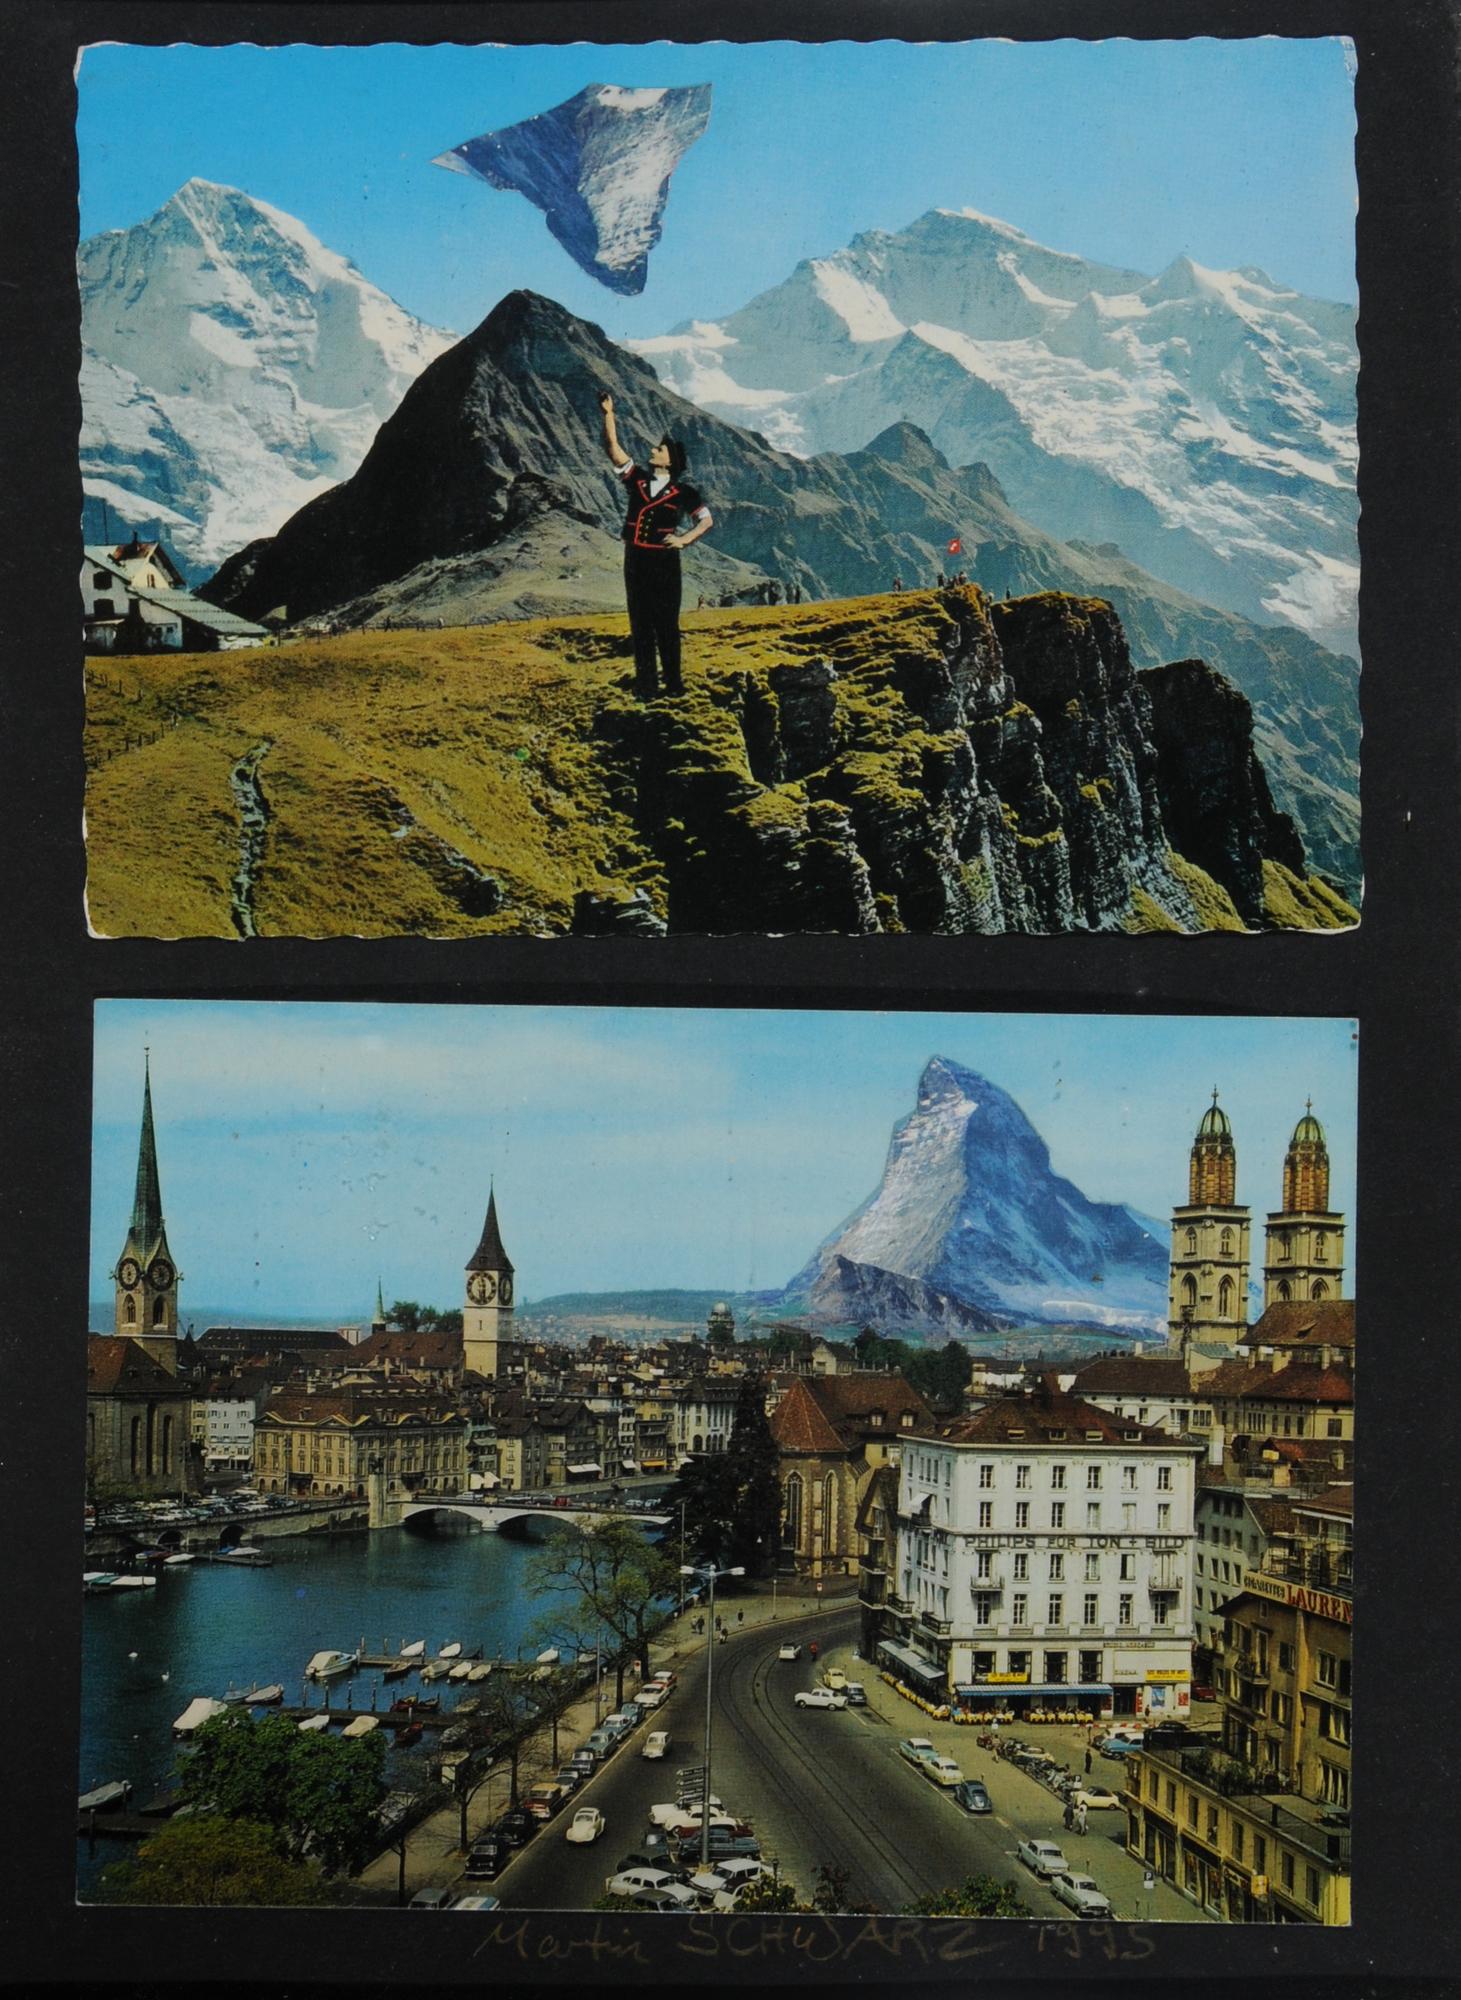 Schwarz Martin, 2 collages: Composition; Landscapes